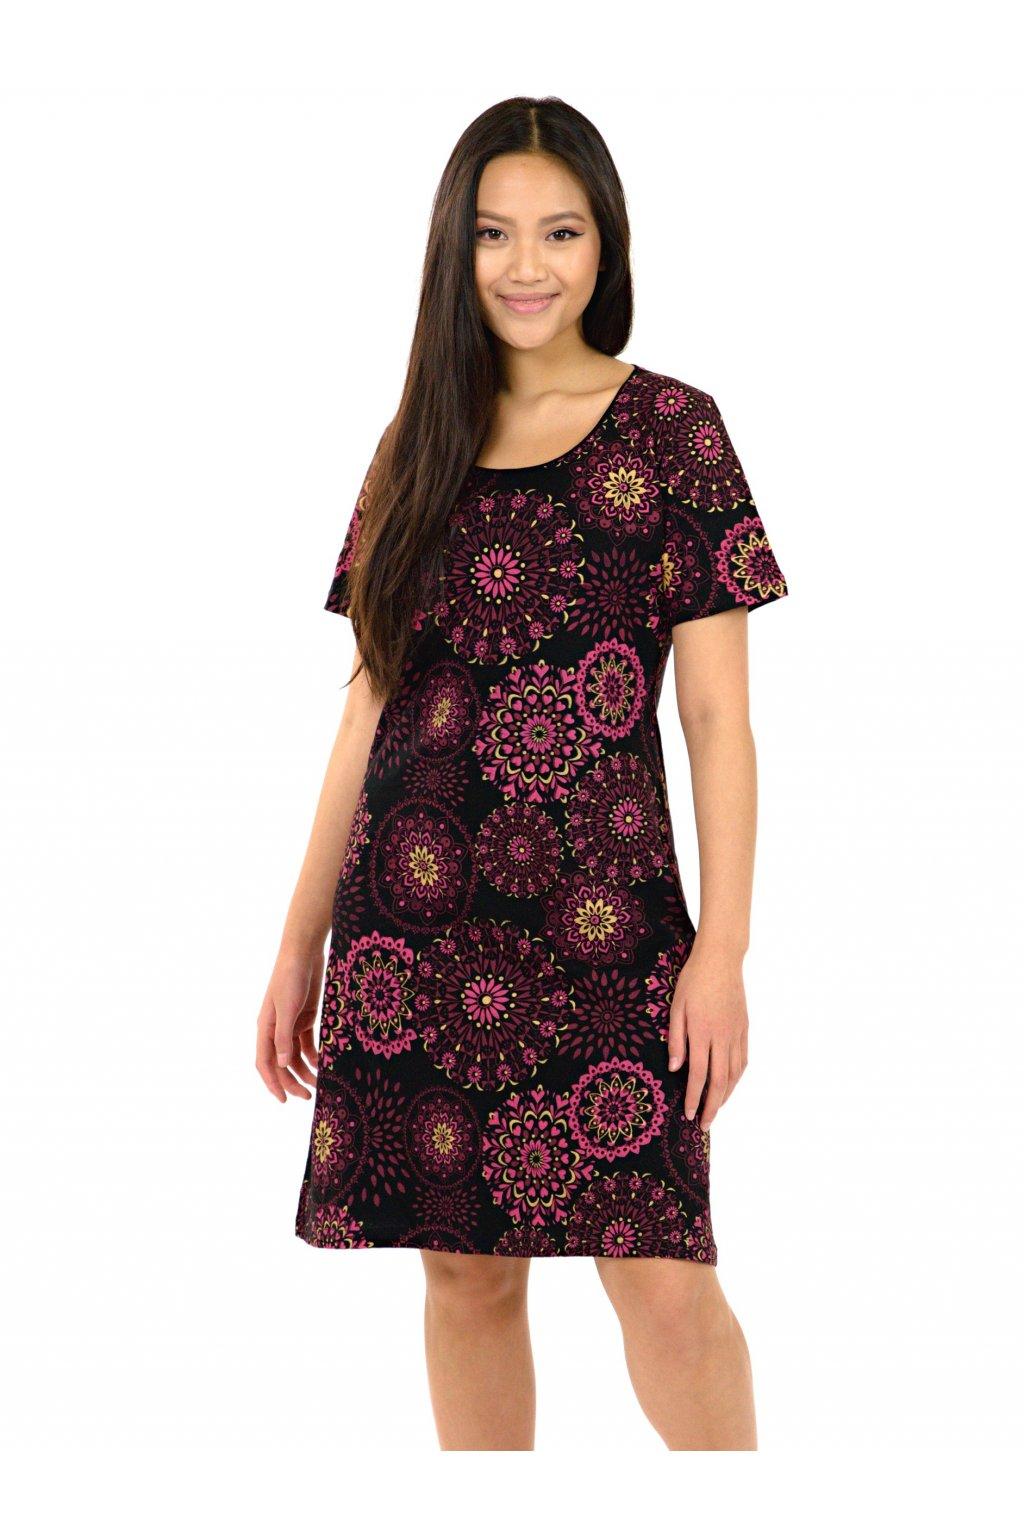 Šaty Manava - černá s růžovou